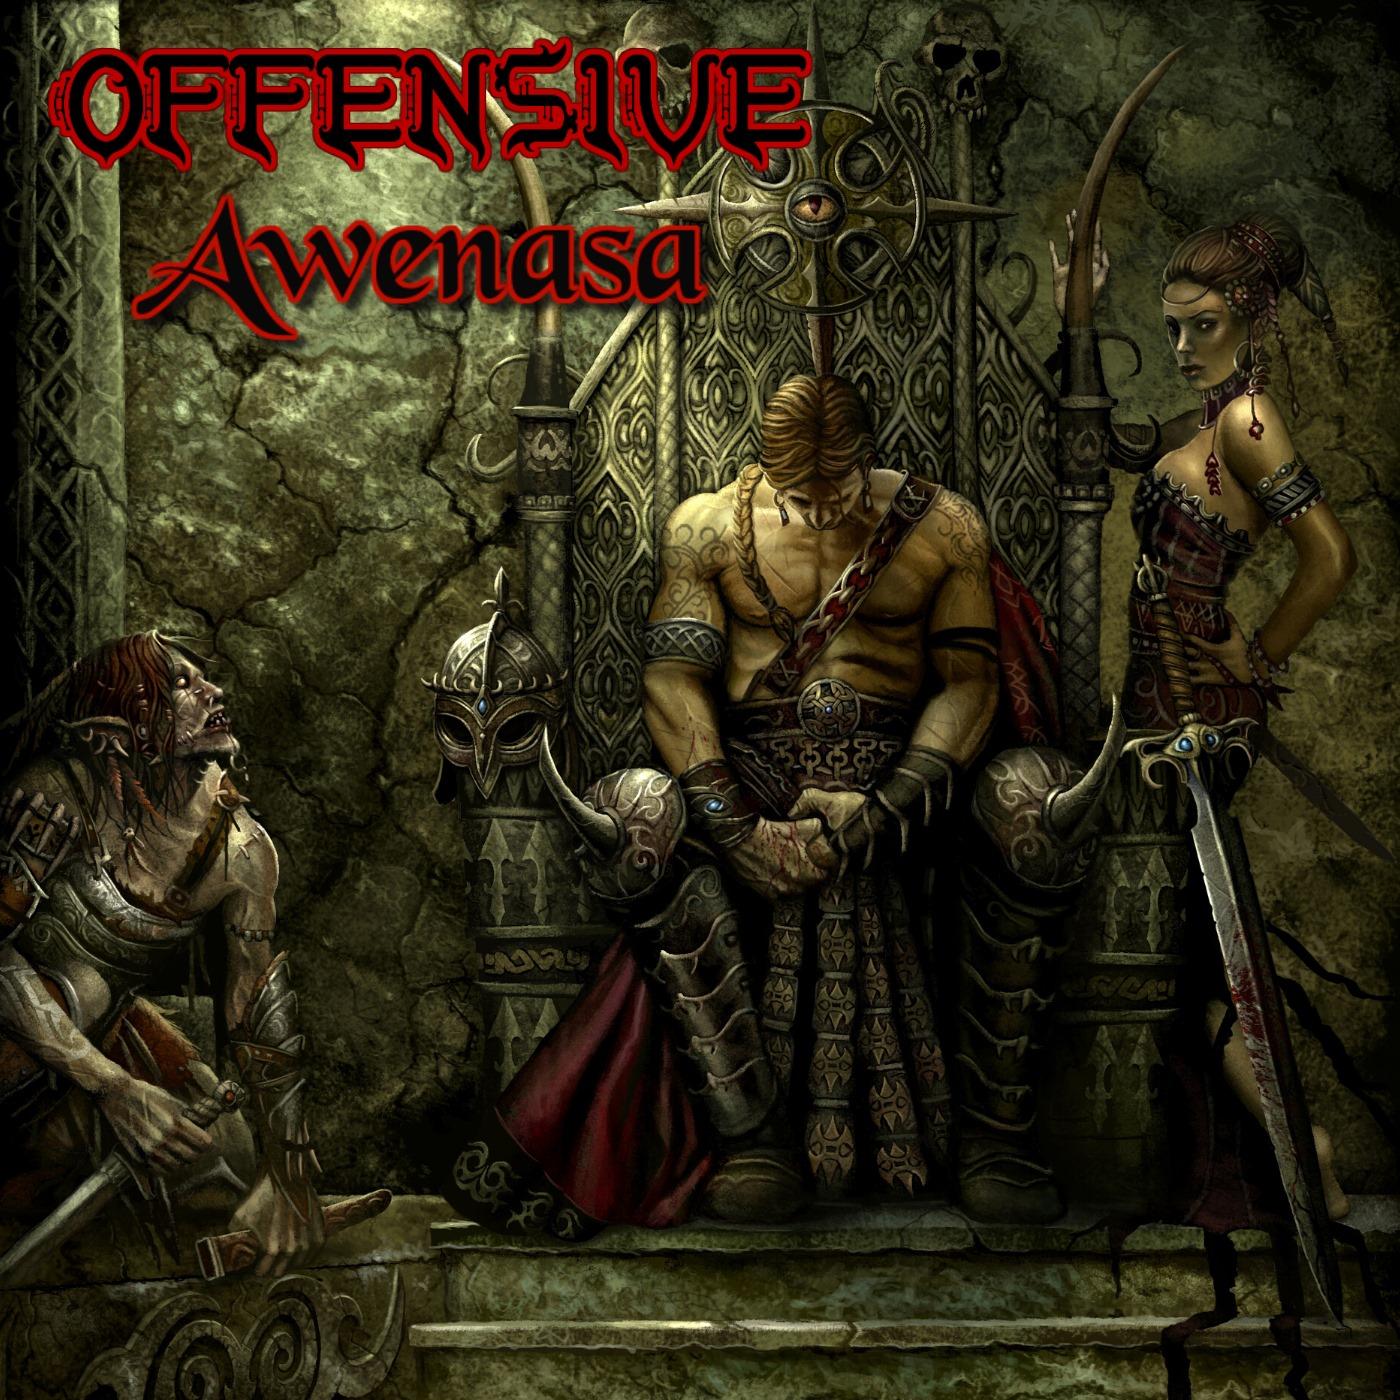 Offensive-Awenasa-album-revealed